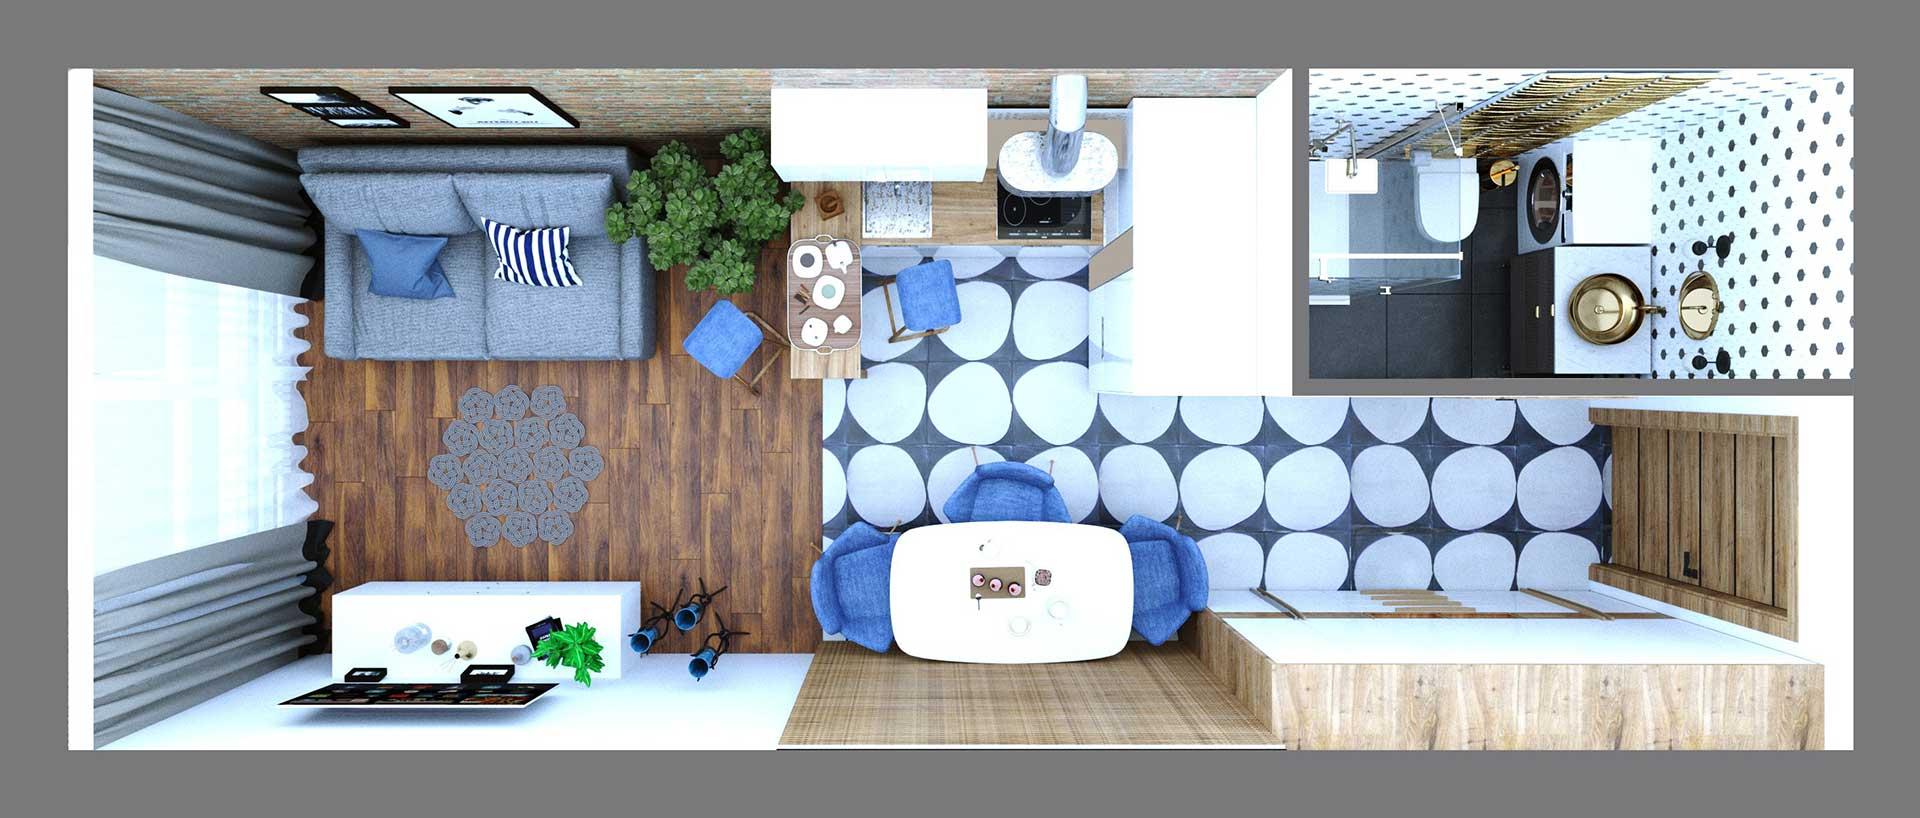 Дизайн проект смарт квартиры (фото 5)